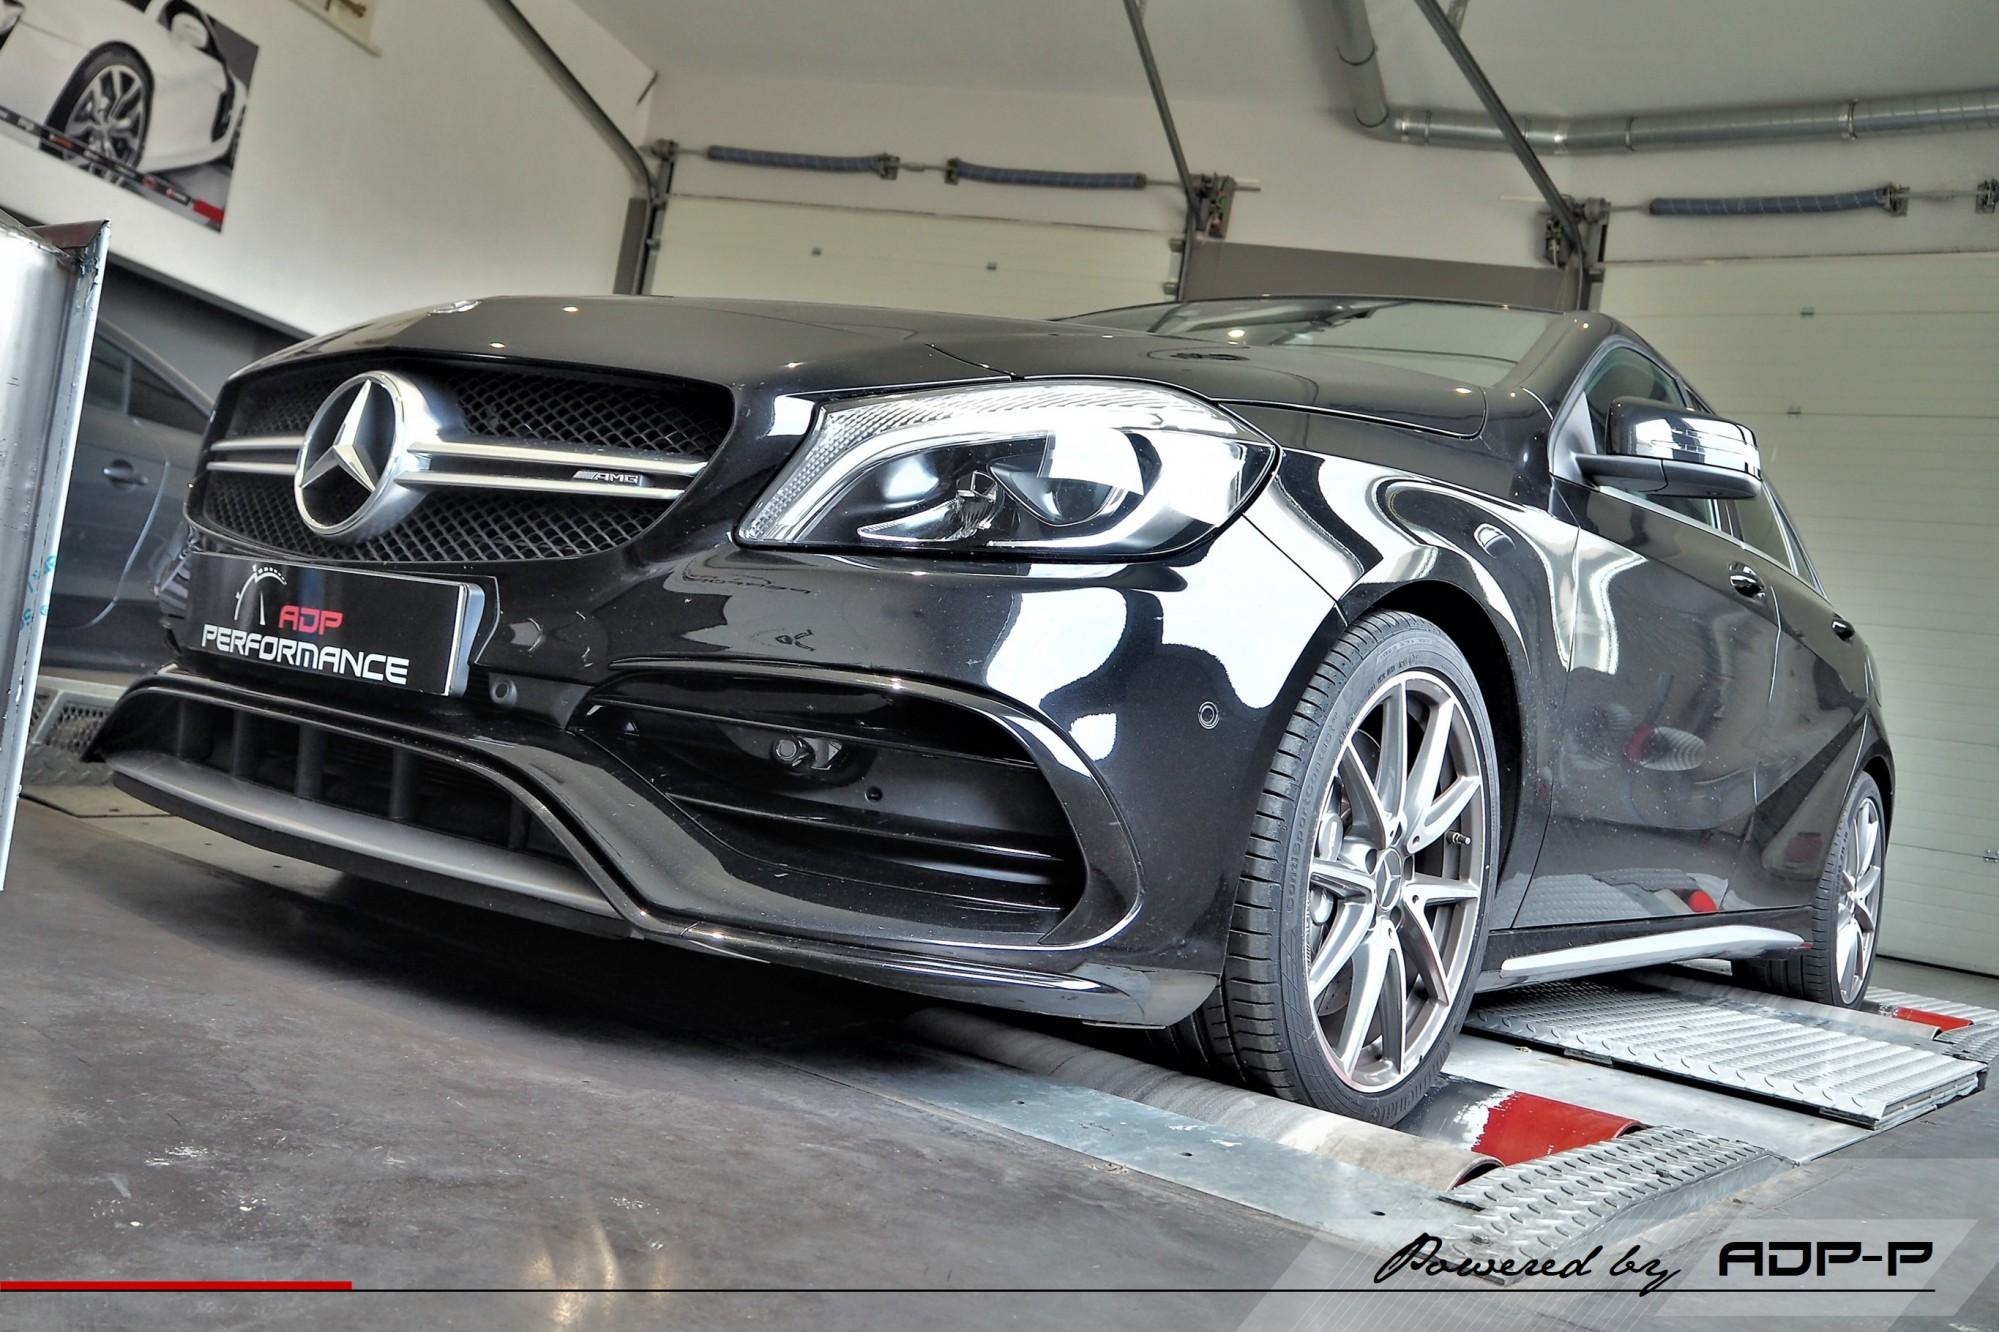 Reprogrammation moteur Marseille, Aubagne, La Ciotat - Mercedes A 45 AMG 381cv - ADP Performance